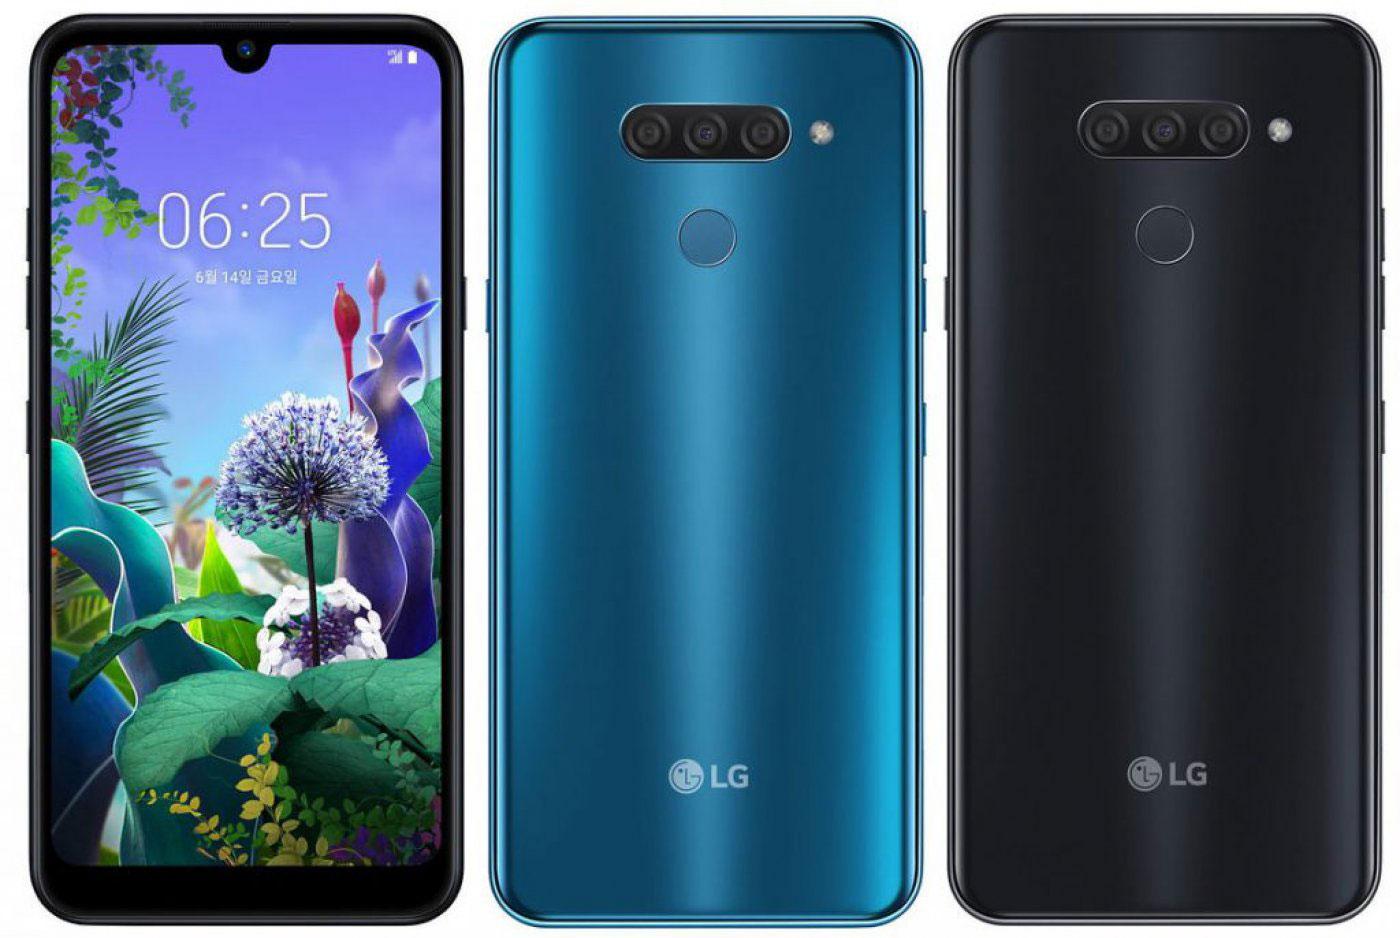 ال جی ایکس ۶ (LG X6)